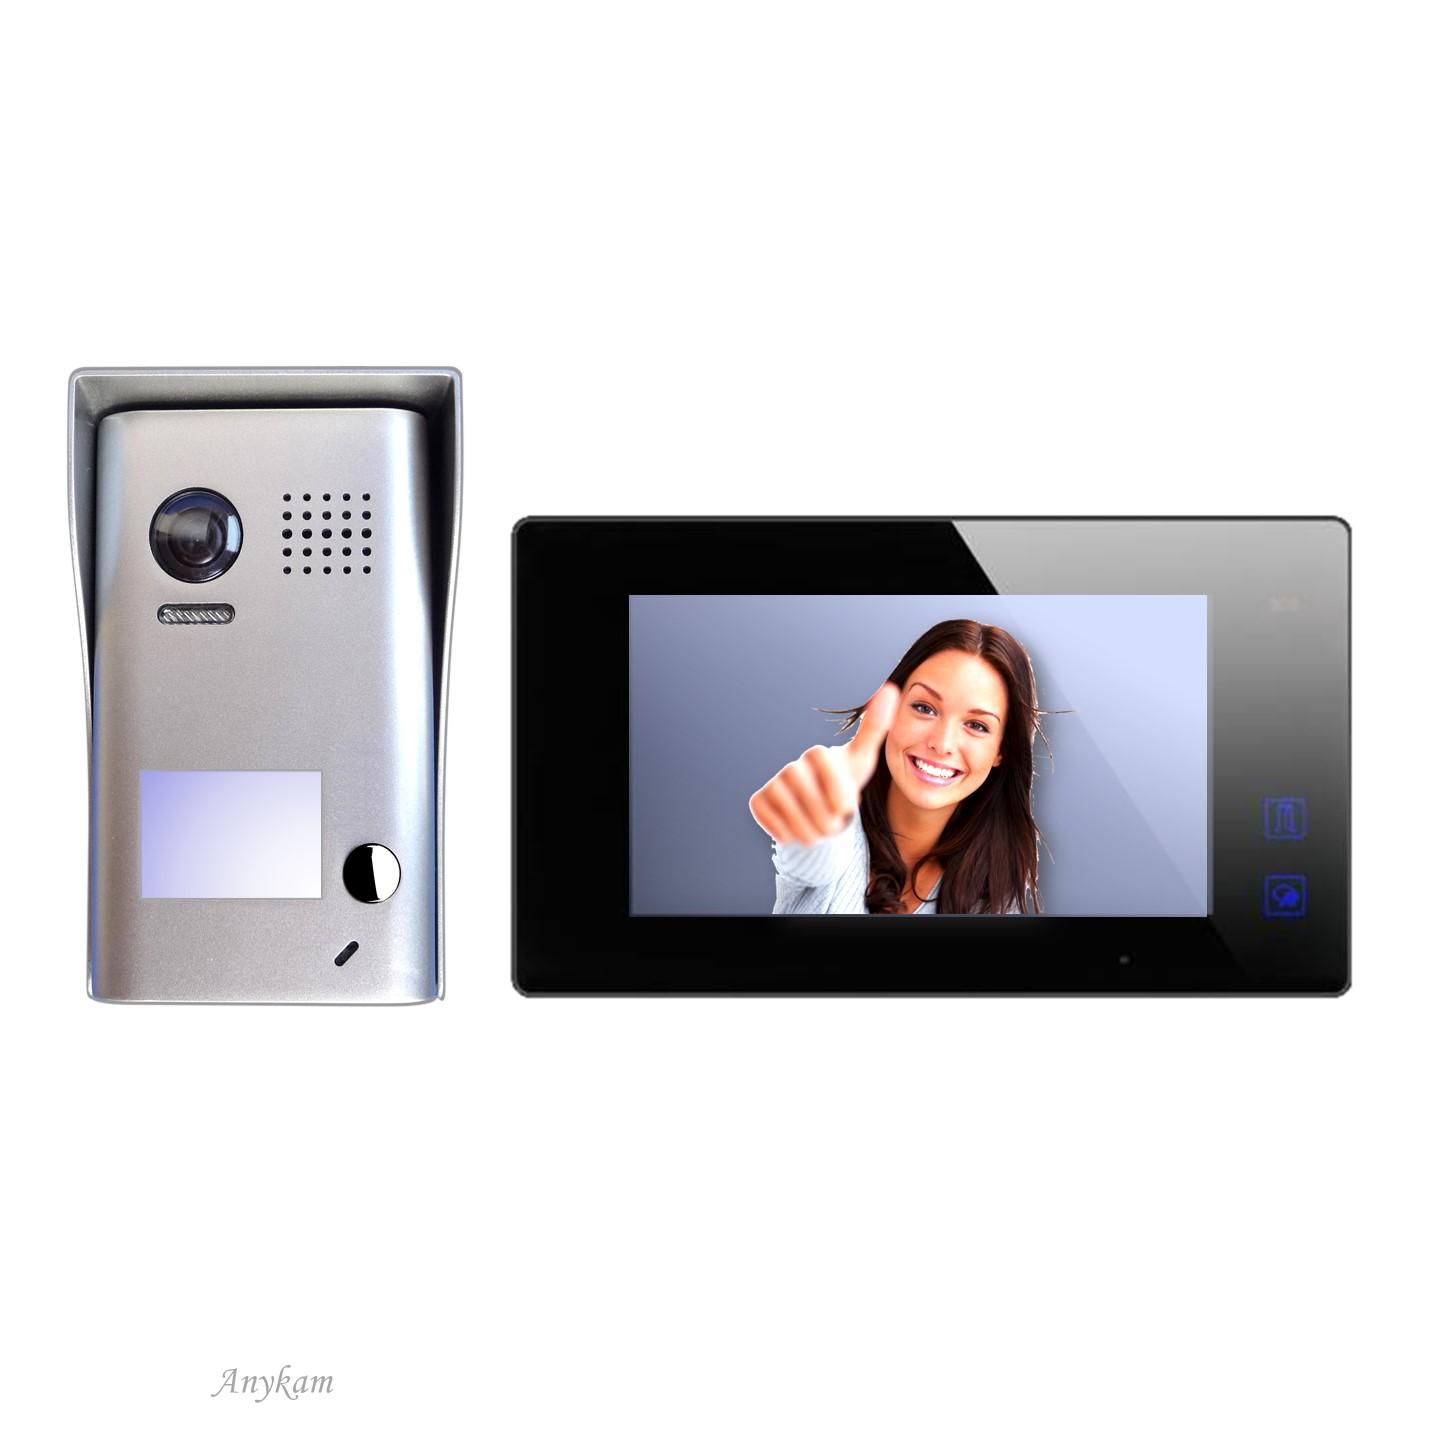 DT602 mit DT47MB Design Farb Video Türsprechanalge Videosprechanlage Gegensprechanlage Klingelanalge Interfon mit 2-Draht Technik